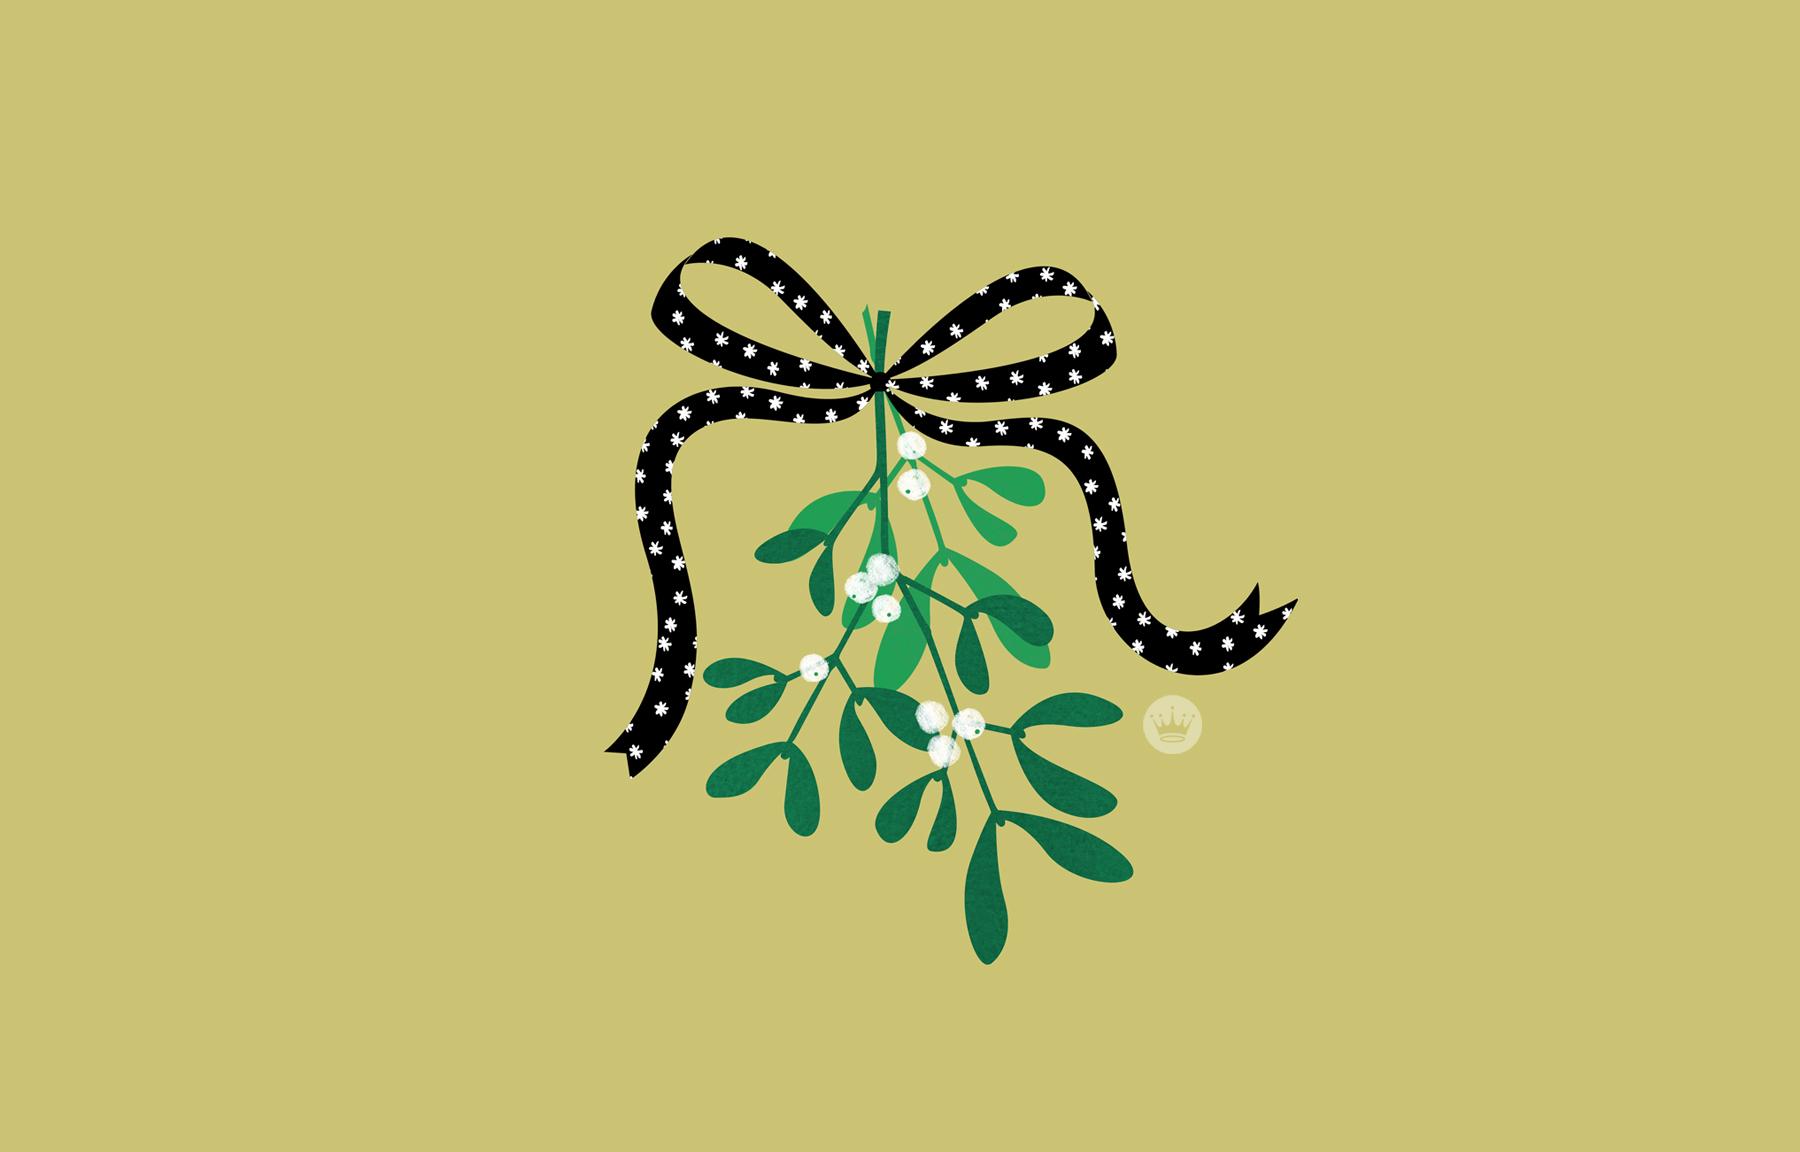 Wallpaper download blog - Download Mistletoe By Hallmark Artist Samantha L Desktop Wallpaper